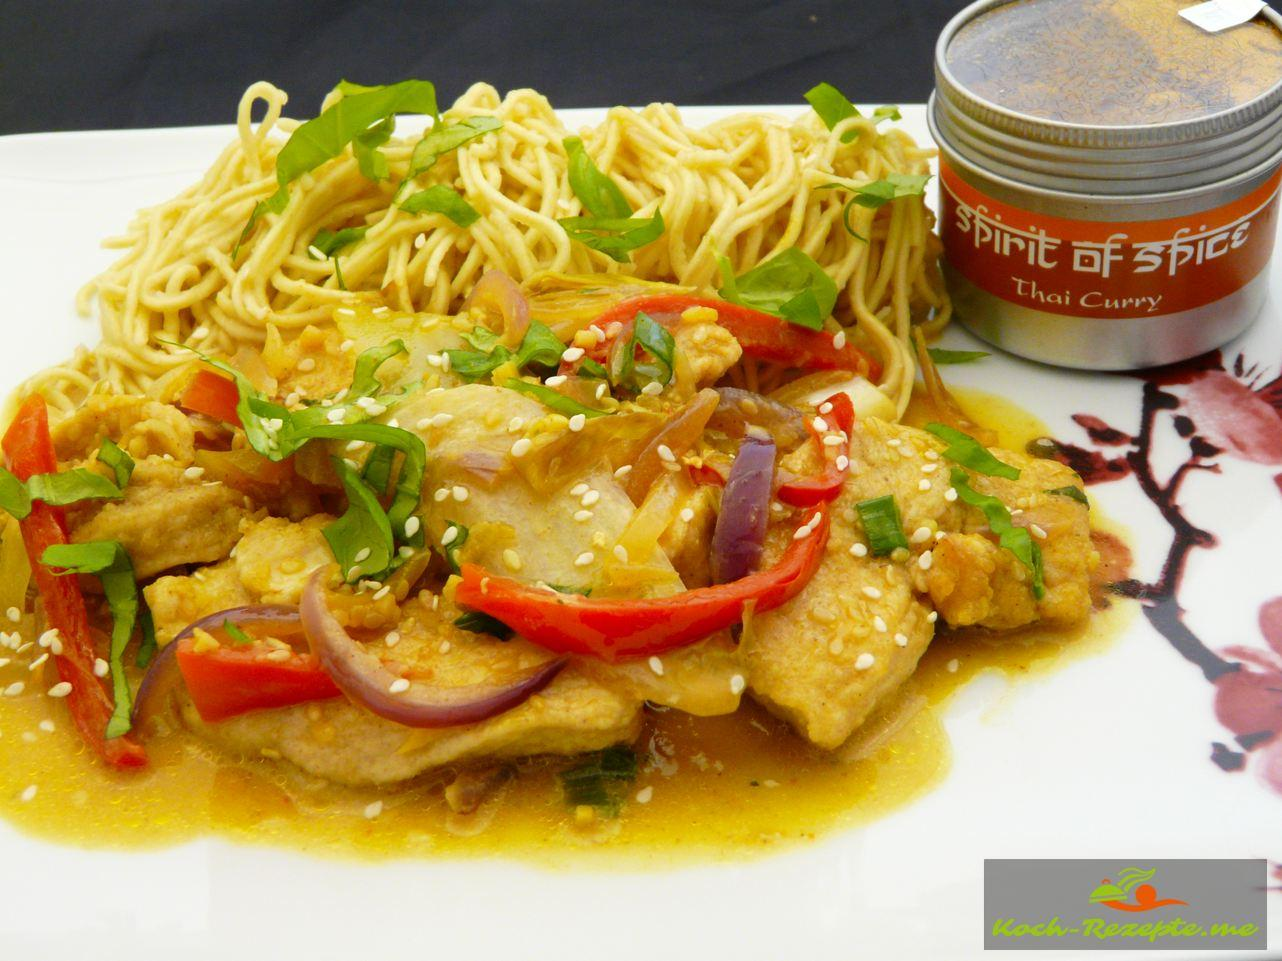 Curry-Huhn Thai oder Wok Hähnchen, กระทะแกงไก่ซอสมะพร้าวกับผัก